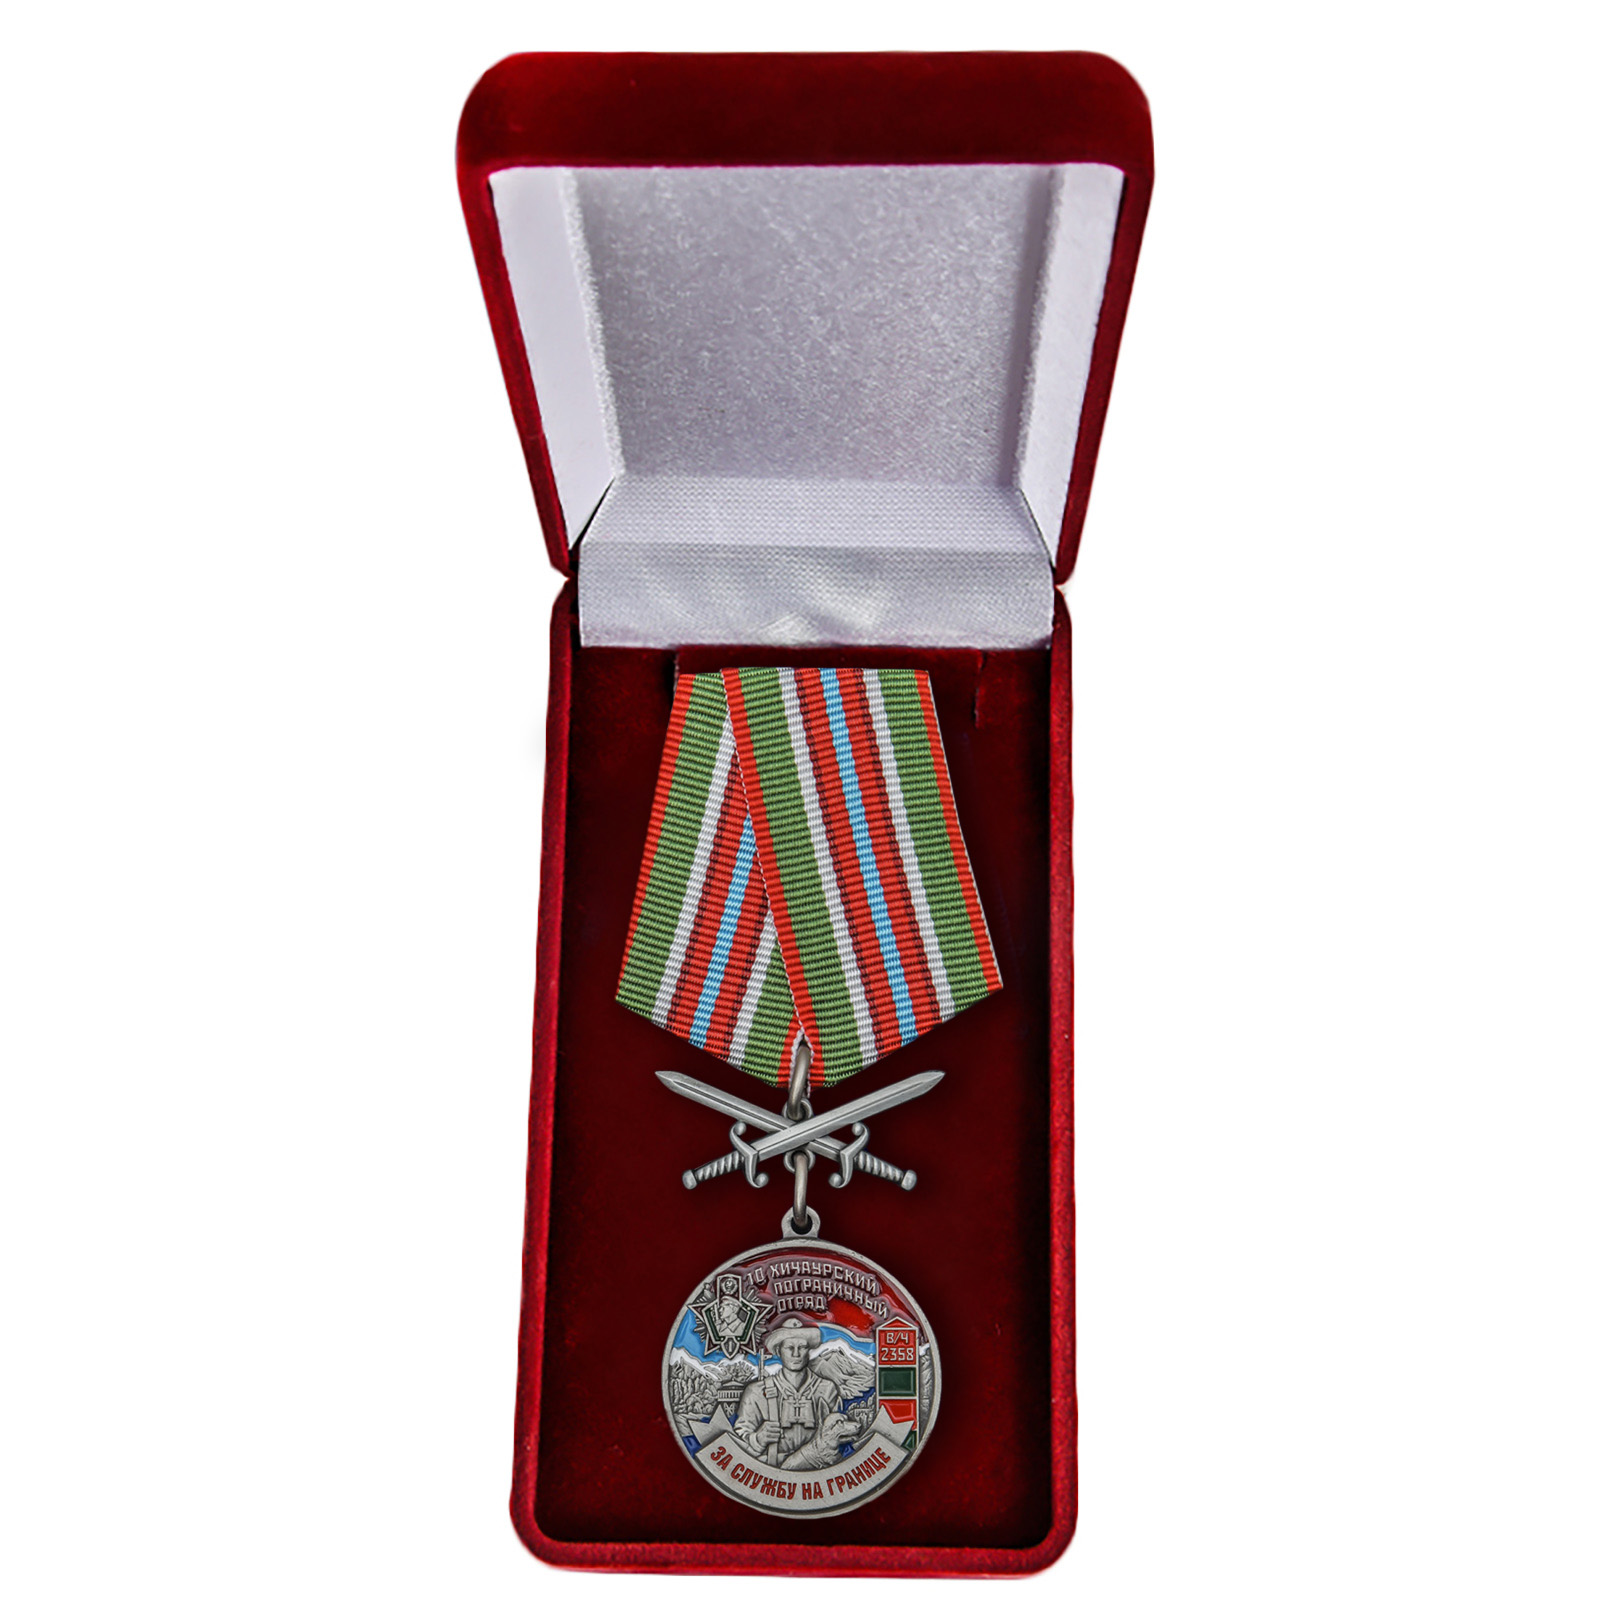 Памятная медаль За службу на границе (10 Хичаурский ПогО) - в футляре